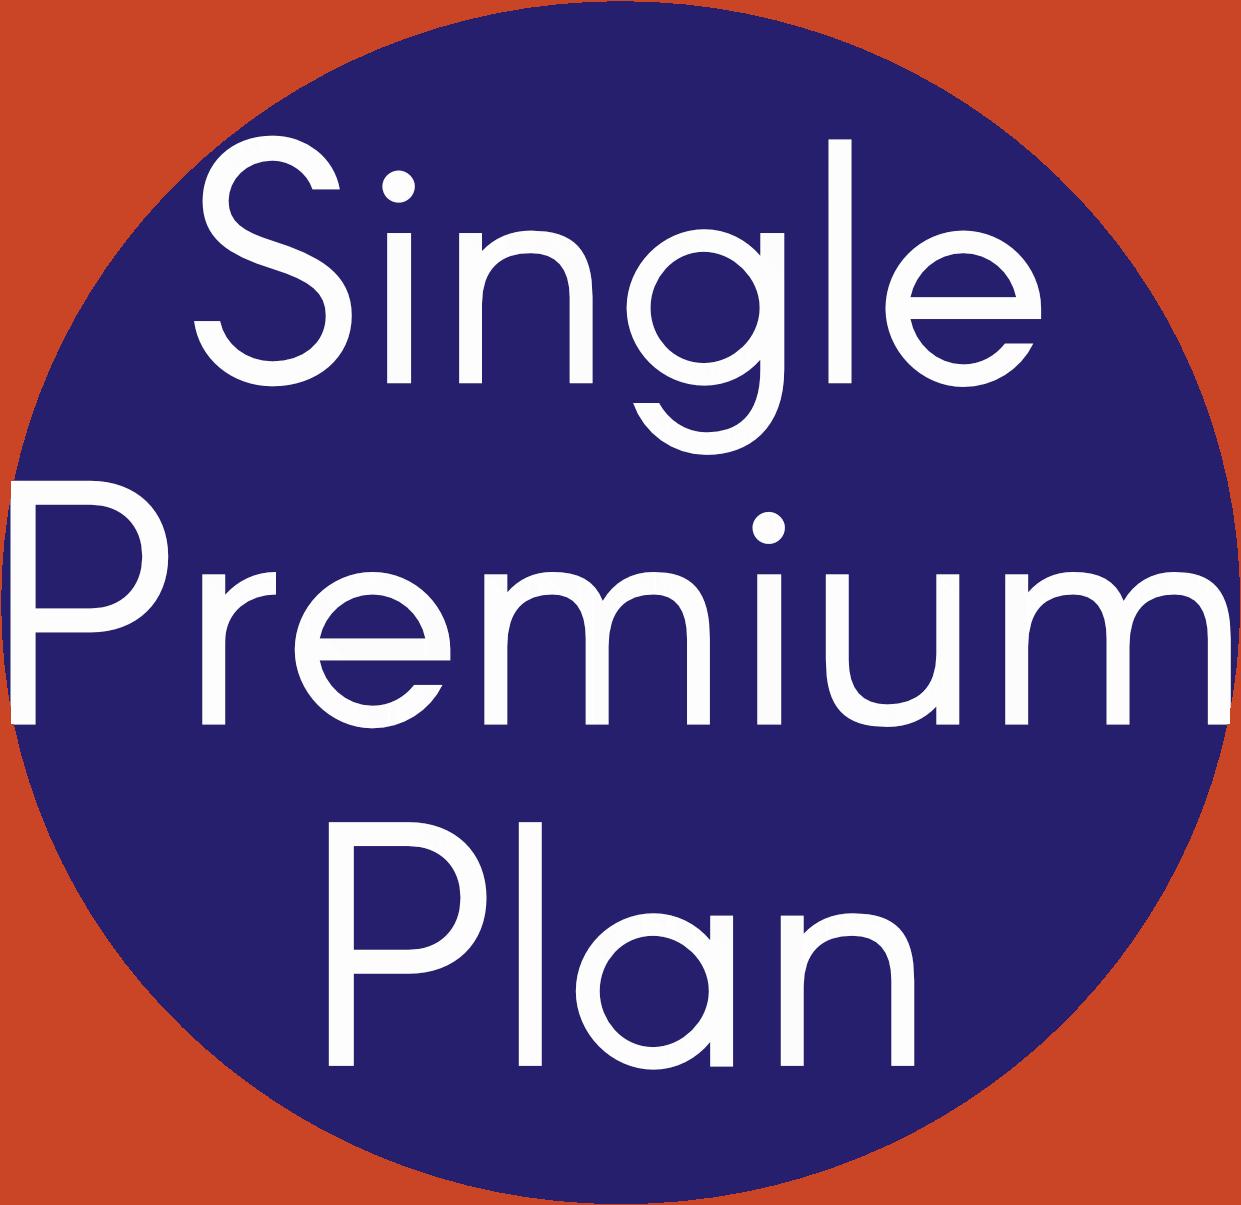 Single Premium.png